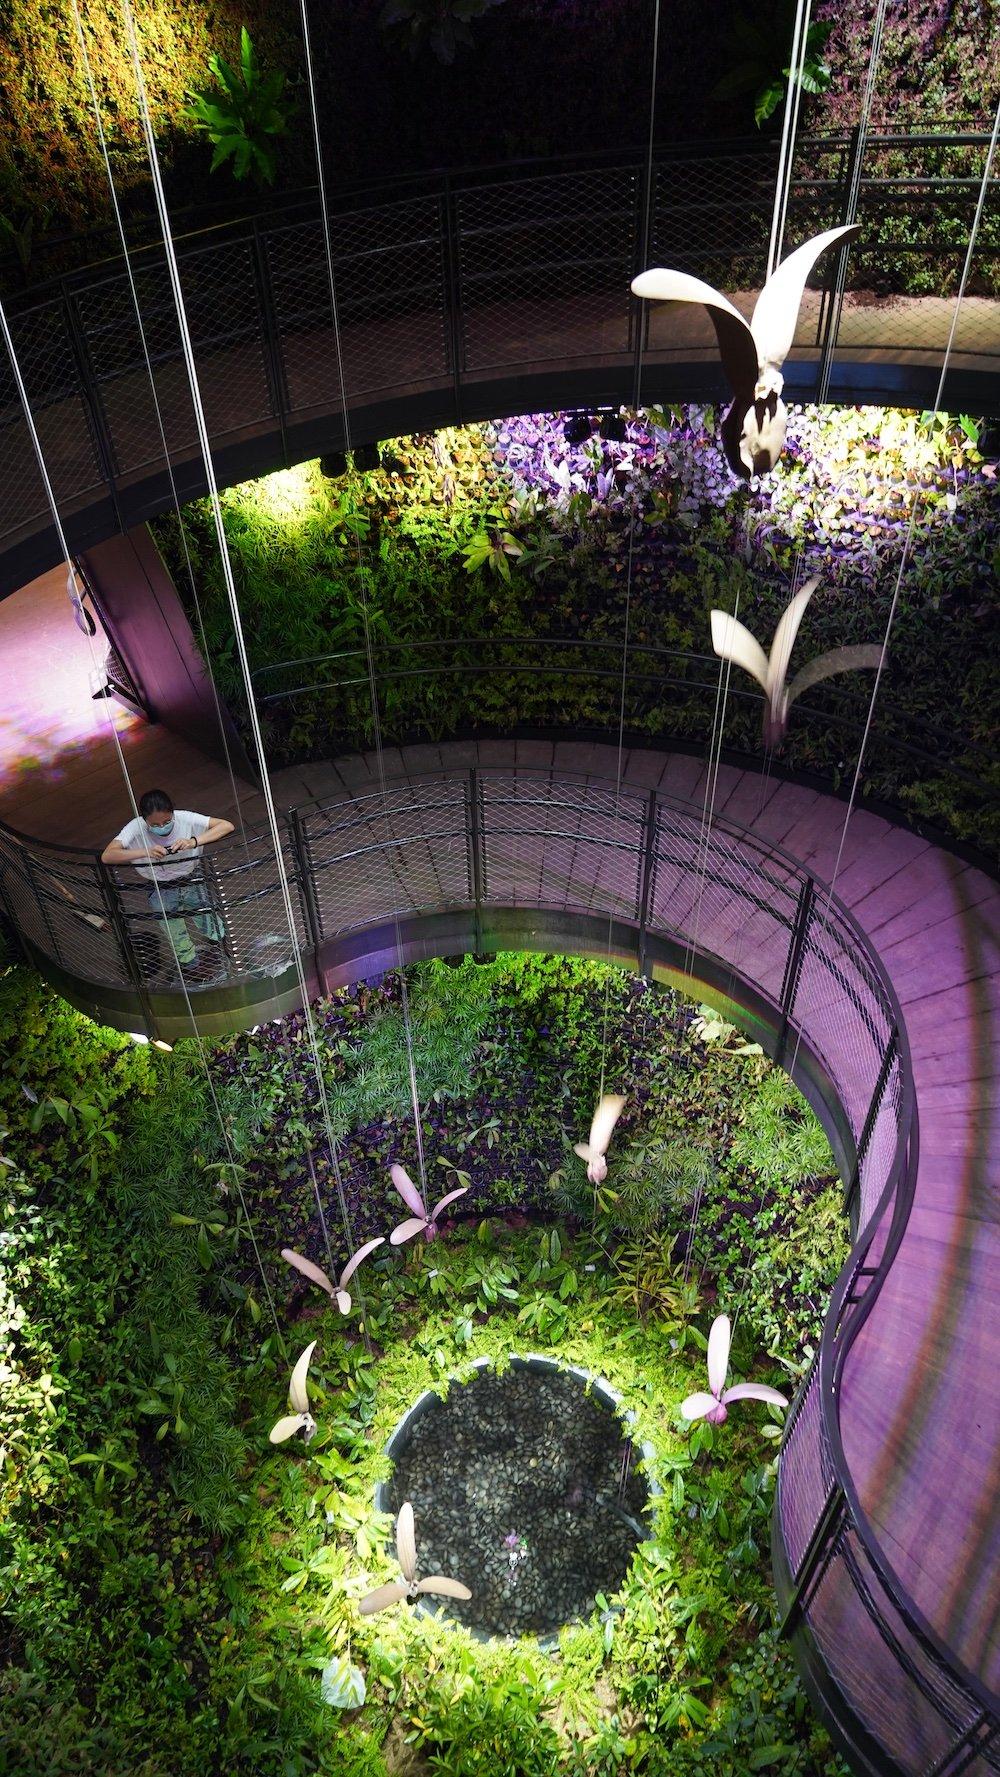 Singapore Pavilion @ Dubai Expo - Dipterocarp seed kinetic sculptures in the Rainforest Cone.